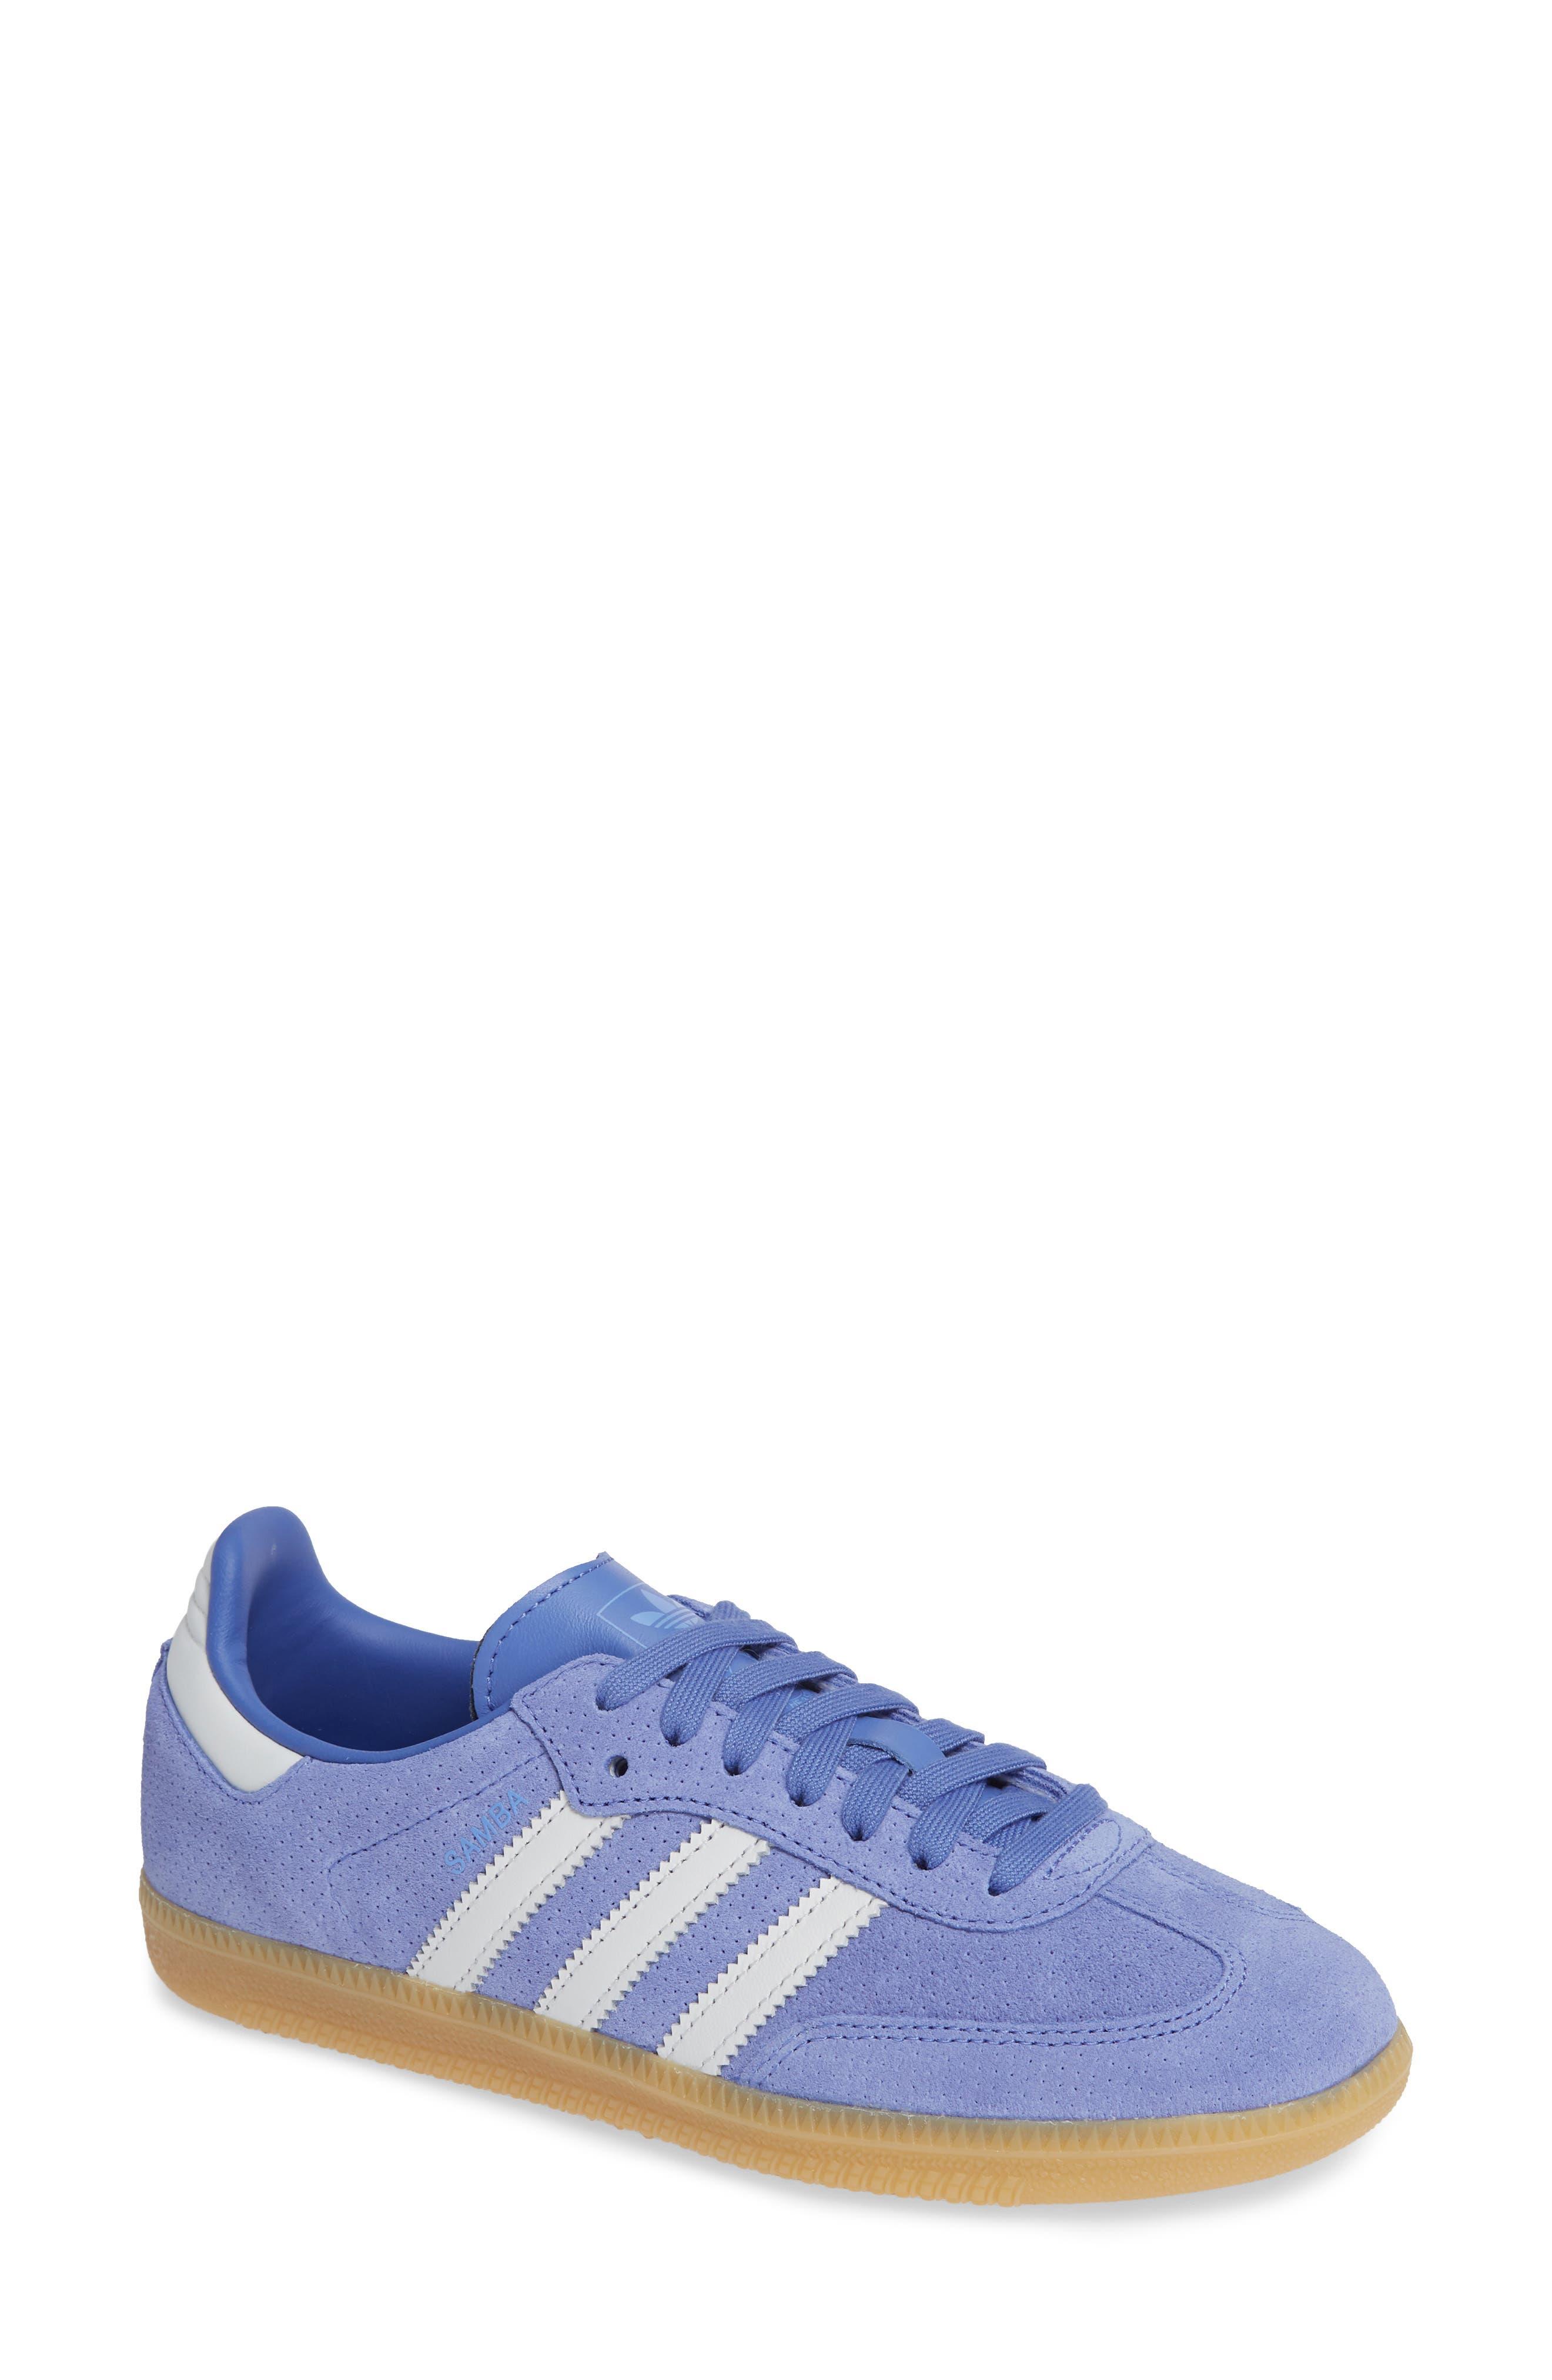 Samba OG Low Top Sneaker, Main, color, 536